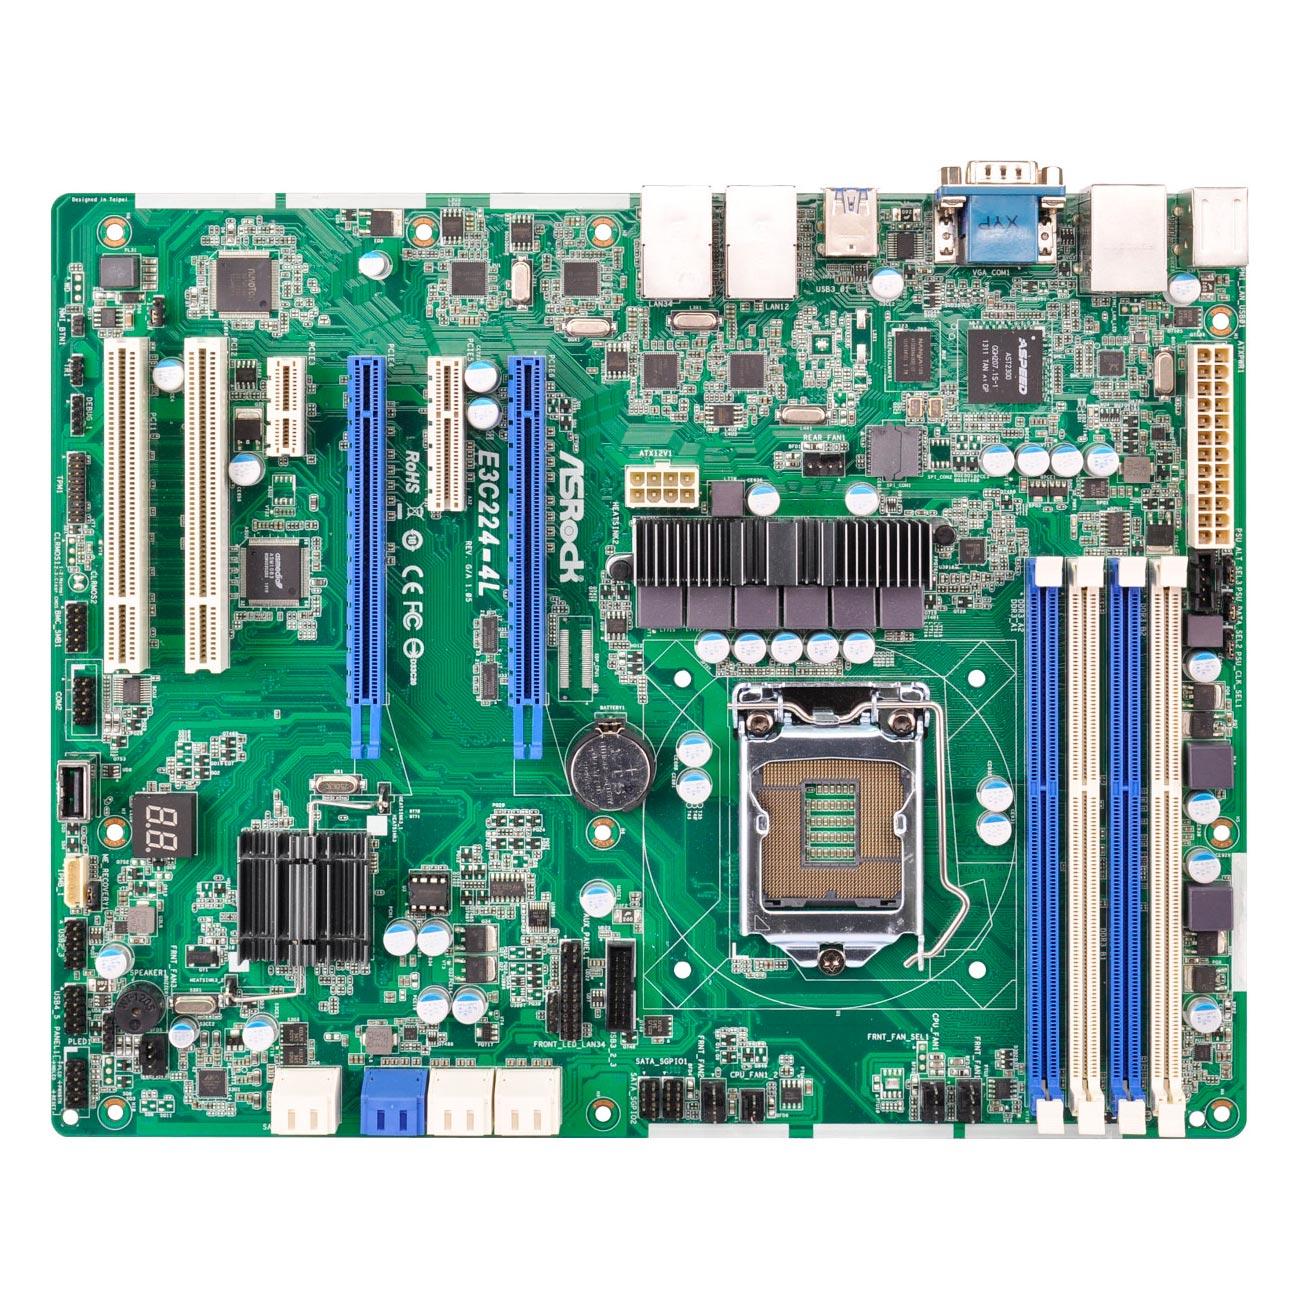 Carte mère ASRock E3C224-4L Carte mère ATX Socket 1150 Intel C224 Aspeed AST2300 - 6x SATA 6Gb/s - 2x PCI Express 3.0 16x - 4 x Gigabit LAN